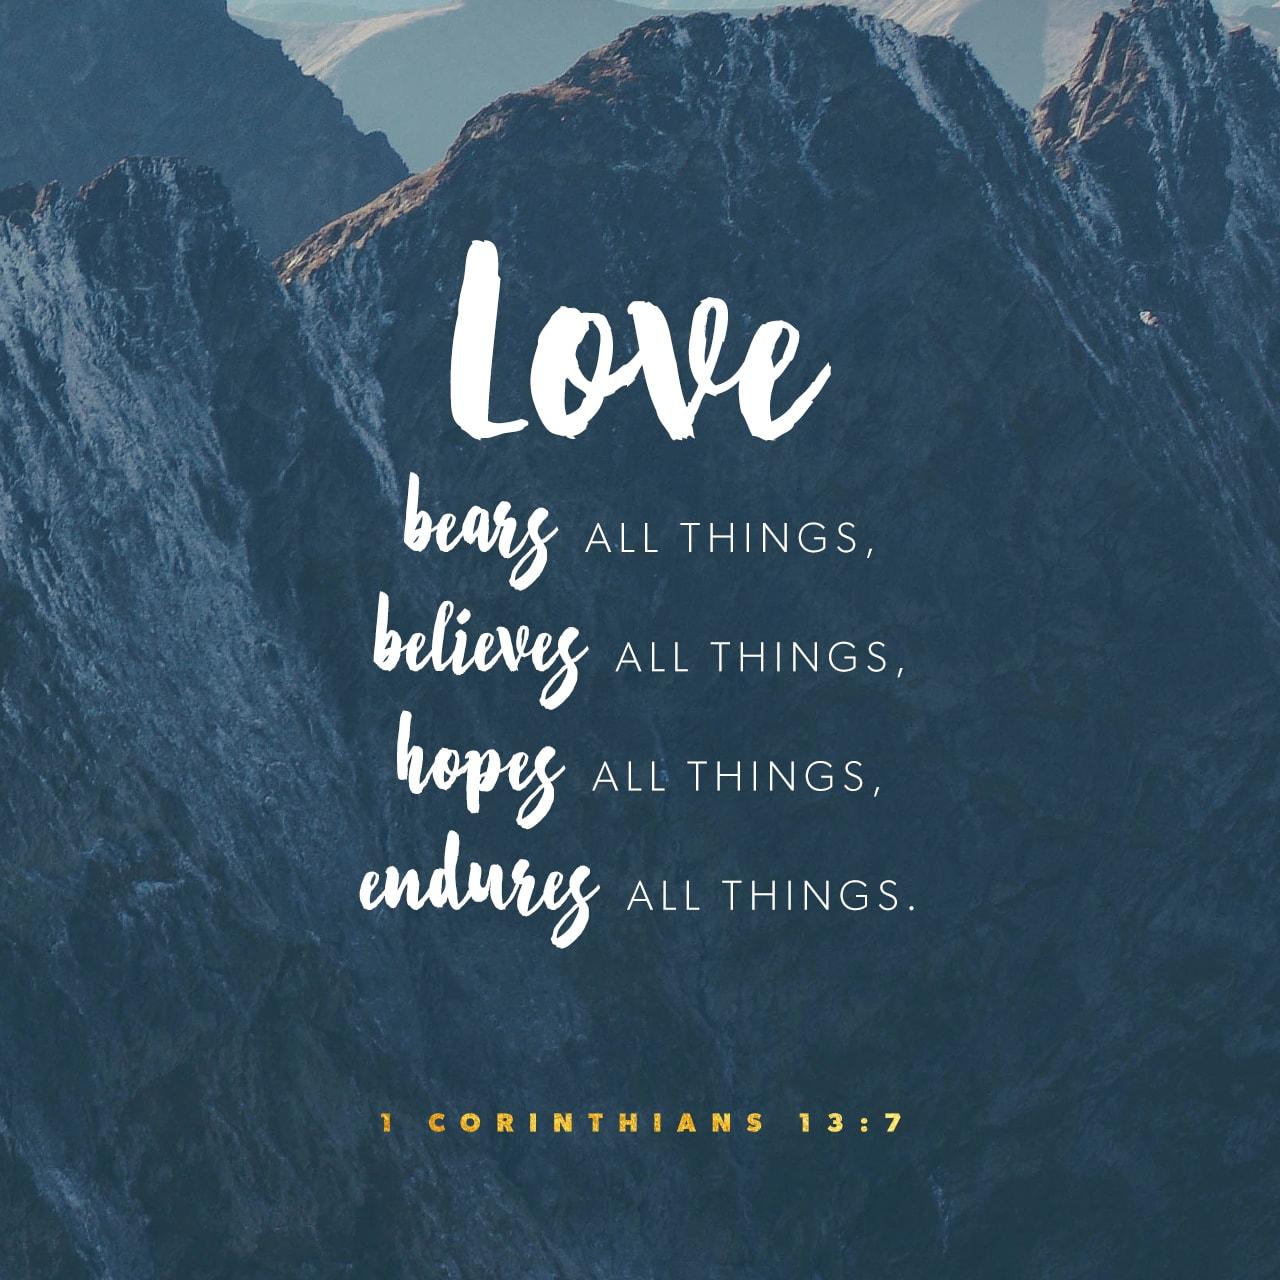 1 Corinthians 13:7 (JPG)